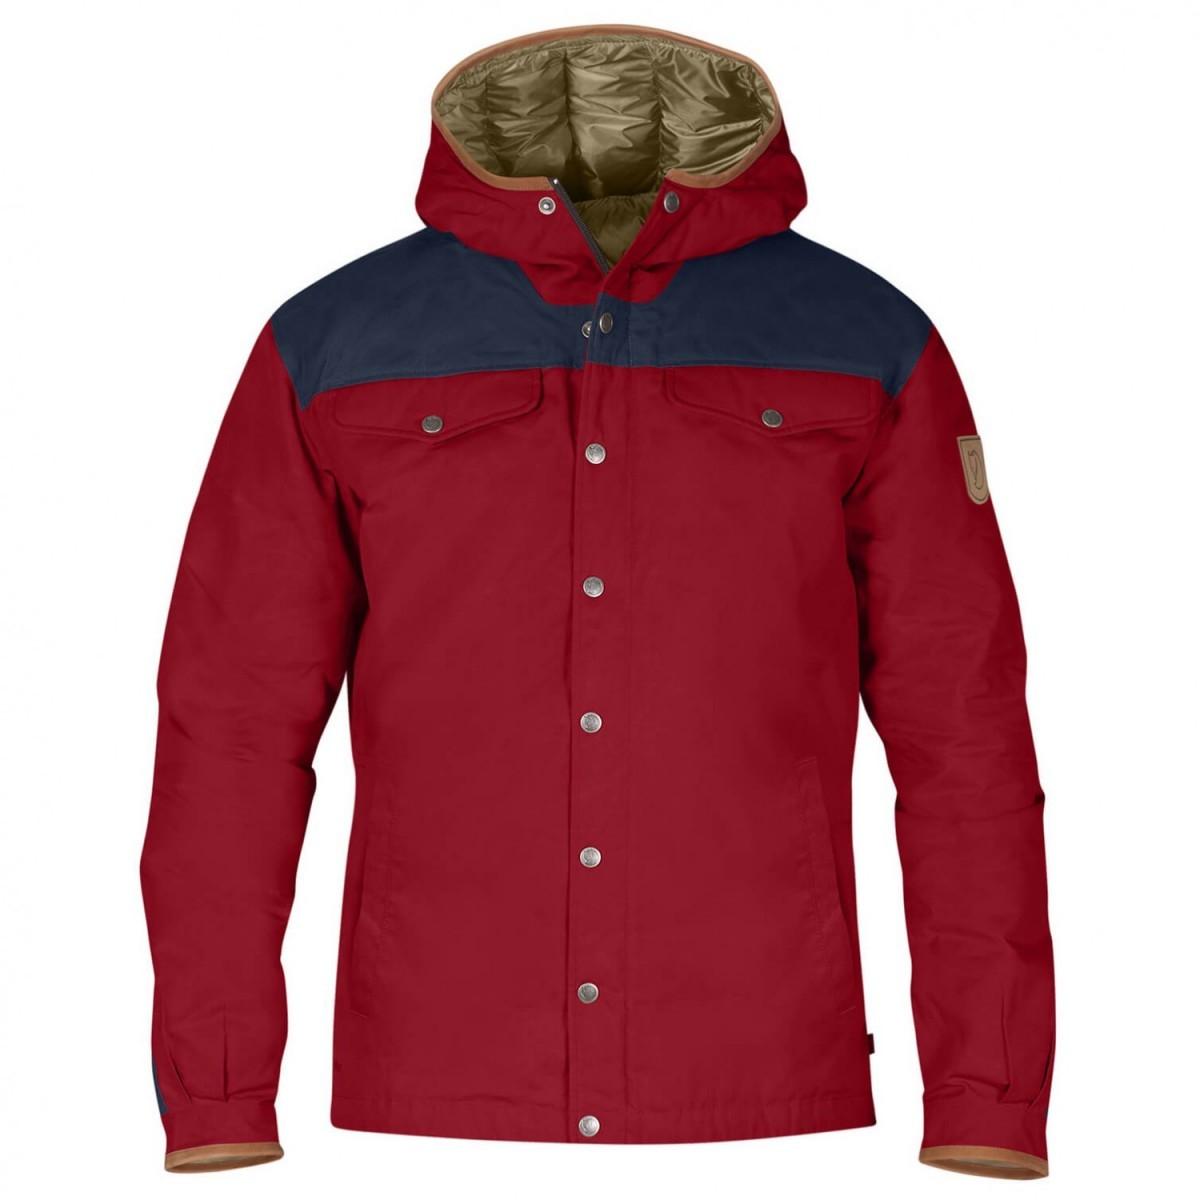 FJALLRAVEN フェールラーベン Greenland No.1 Down Jacket ダウンジャケット (Deep Red)